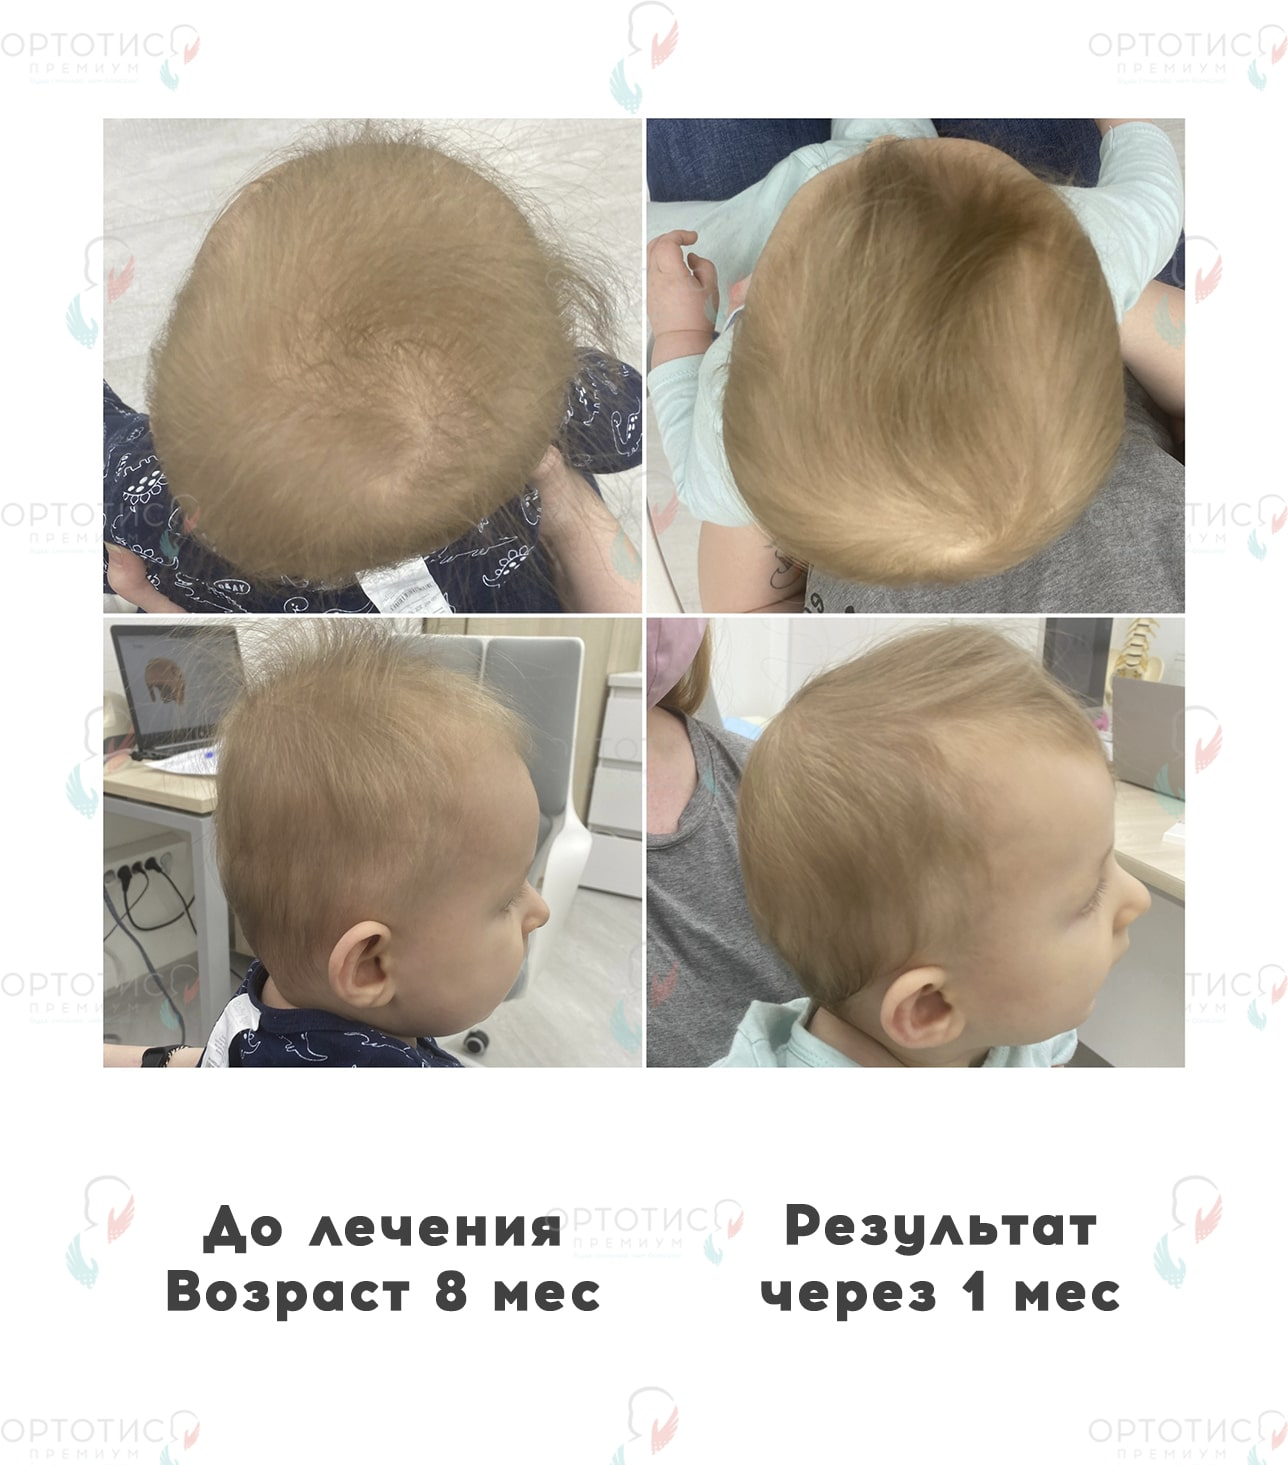 Брахицефалия, 1 месяц - Ортотис Премиум